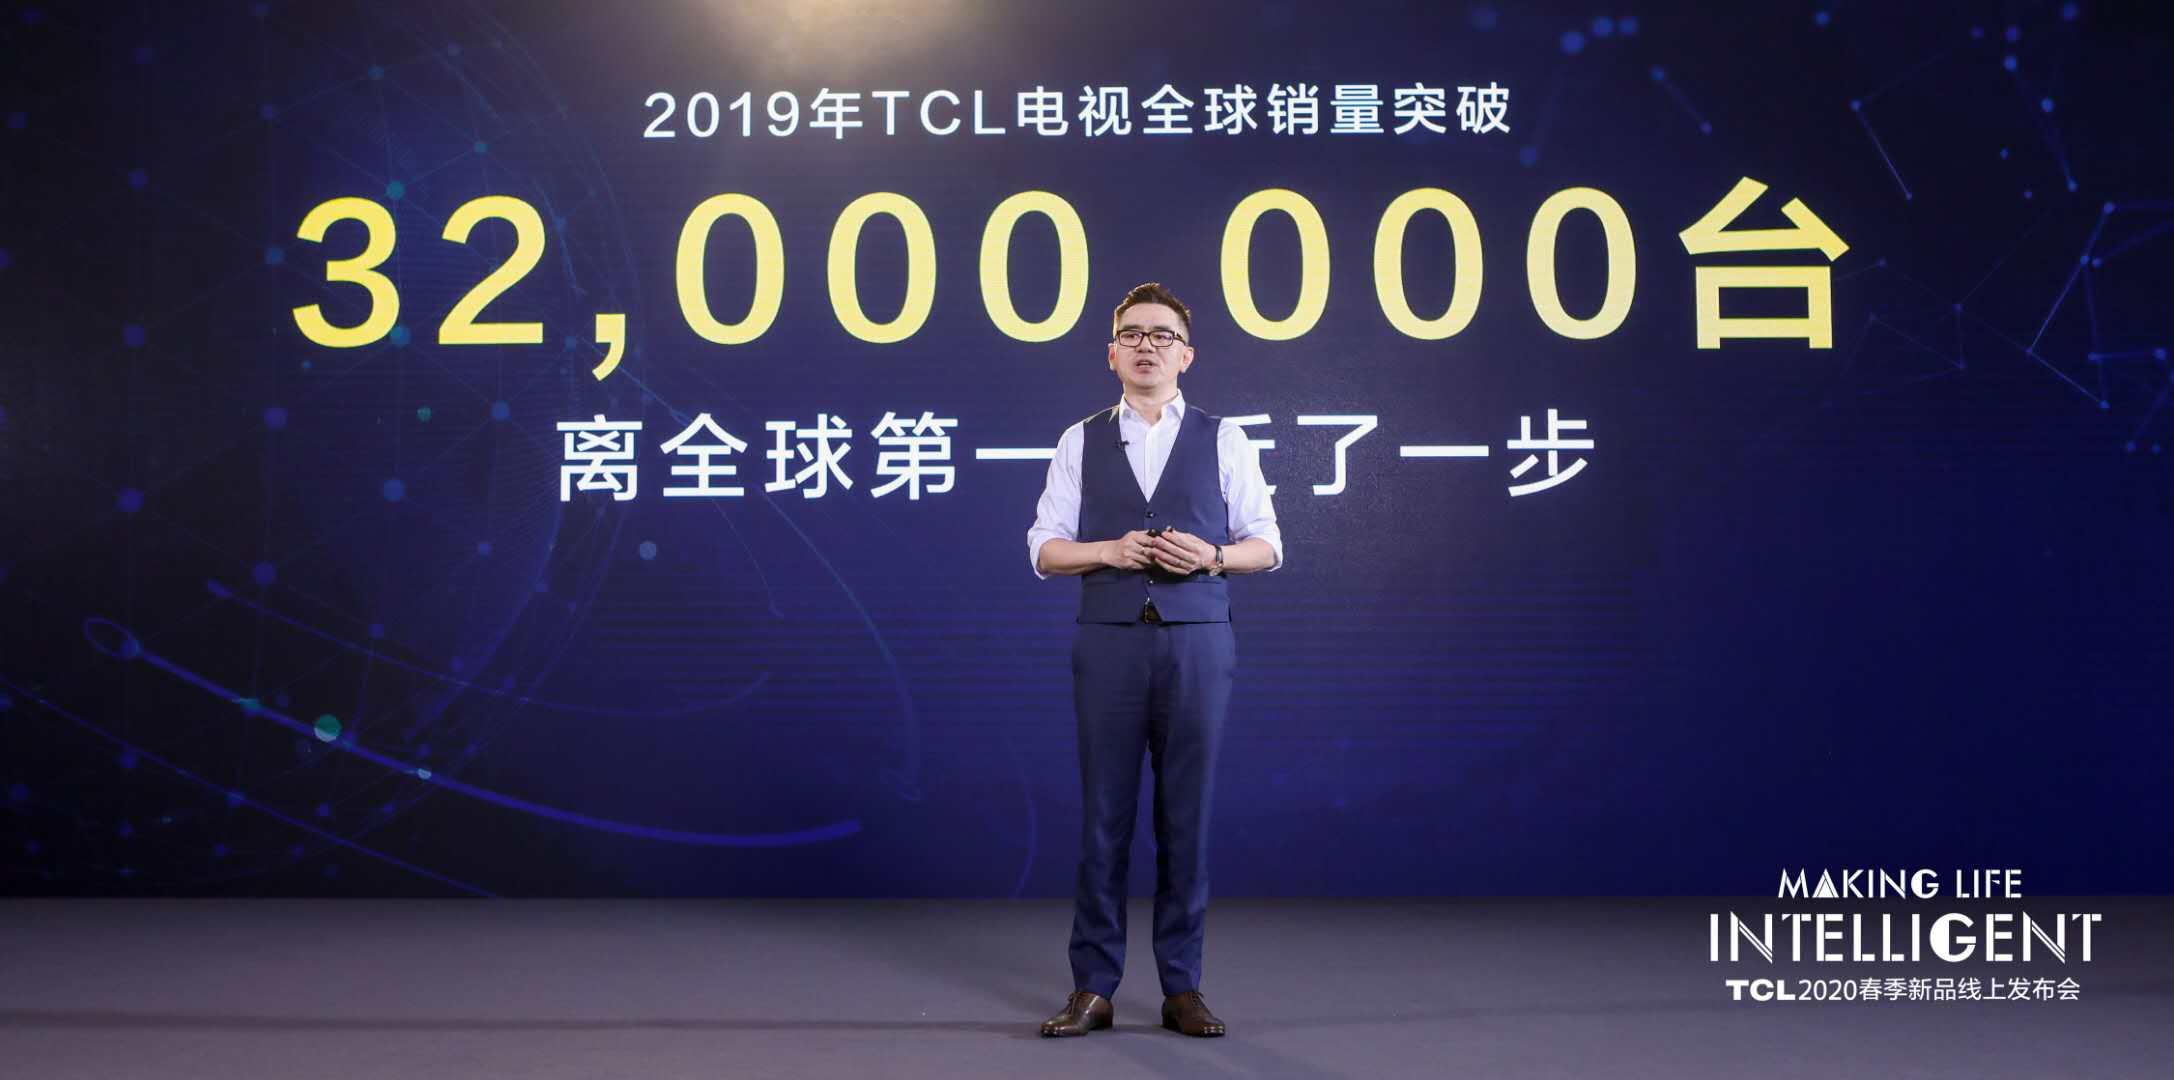 TCL新品发布揭示智能化战略未来两大方向